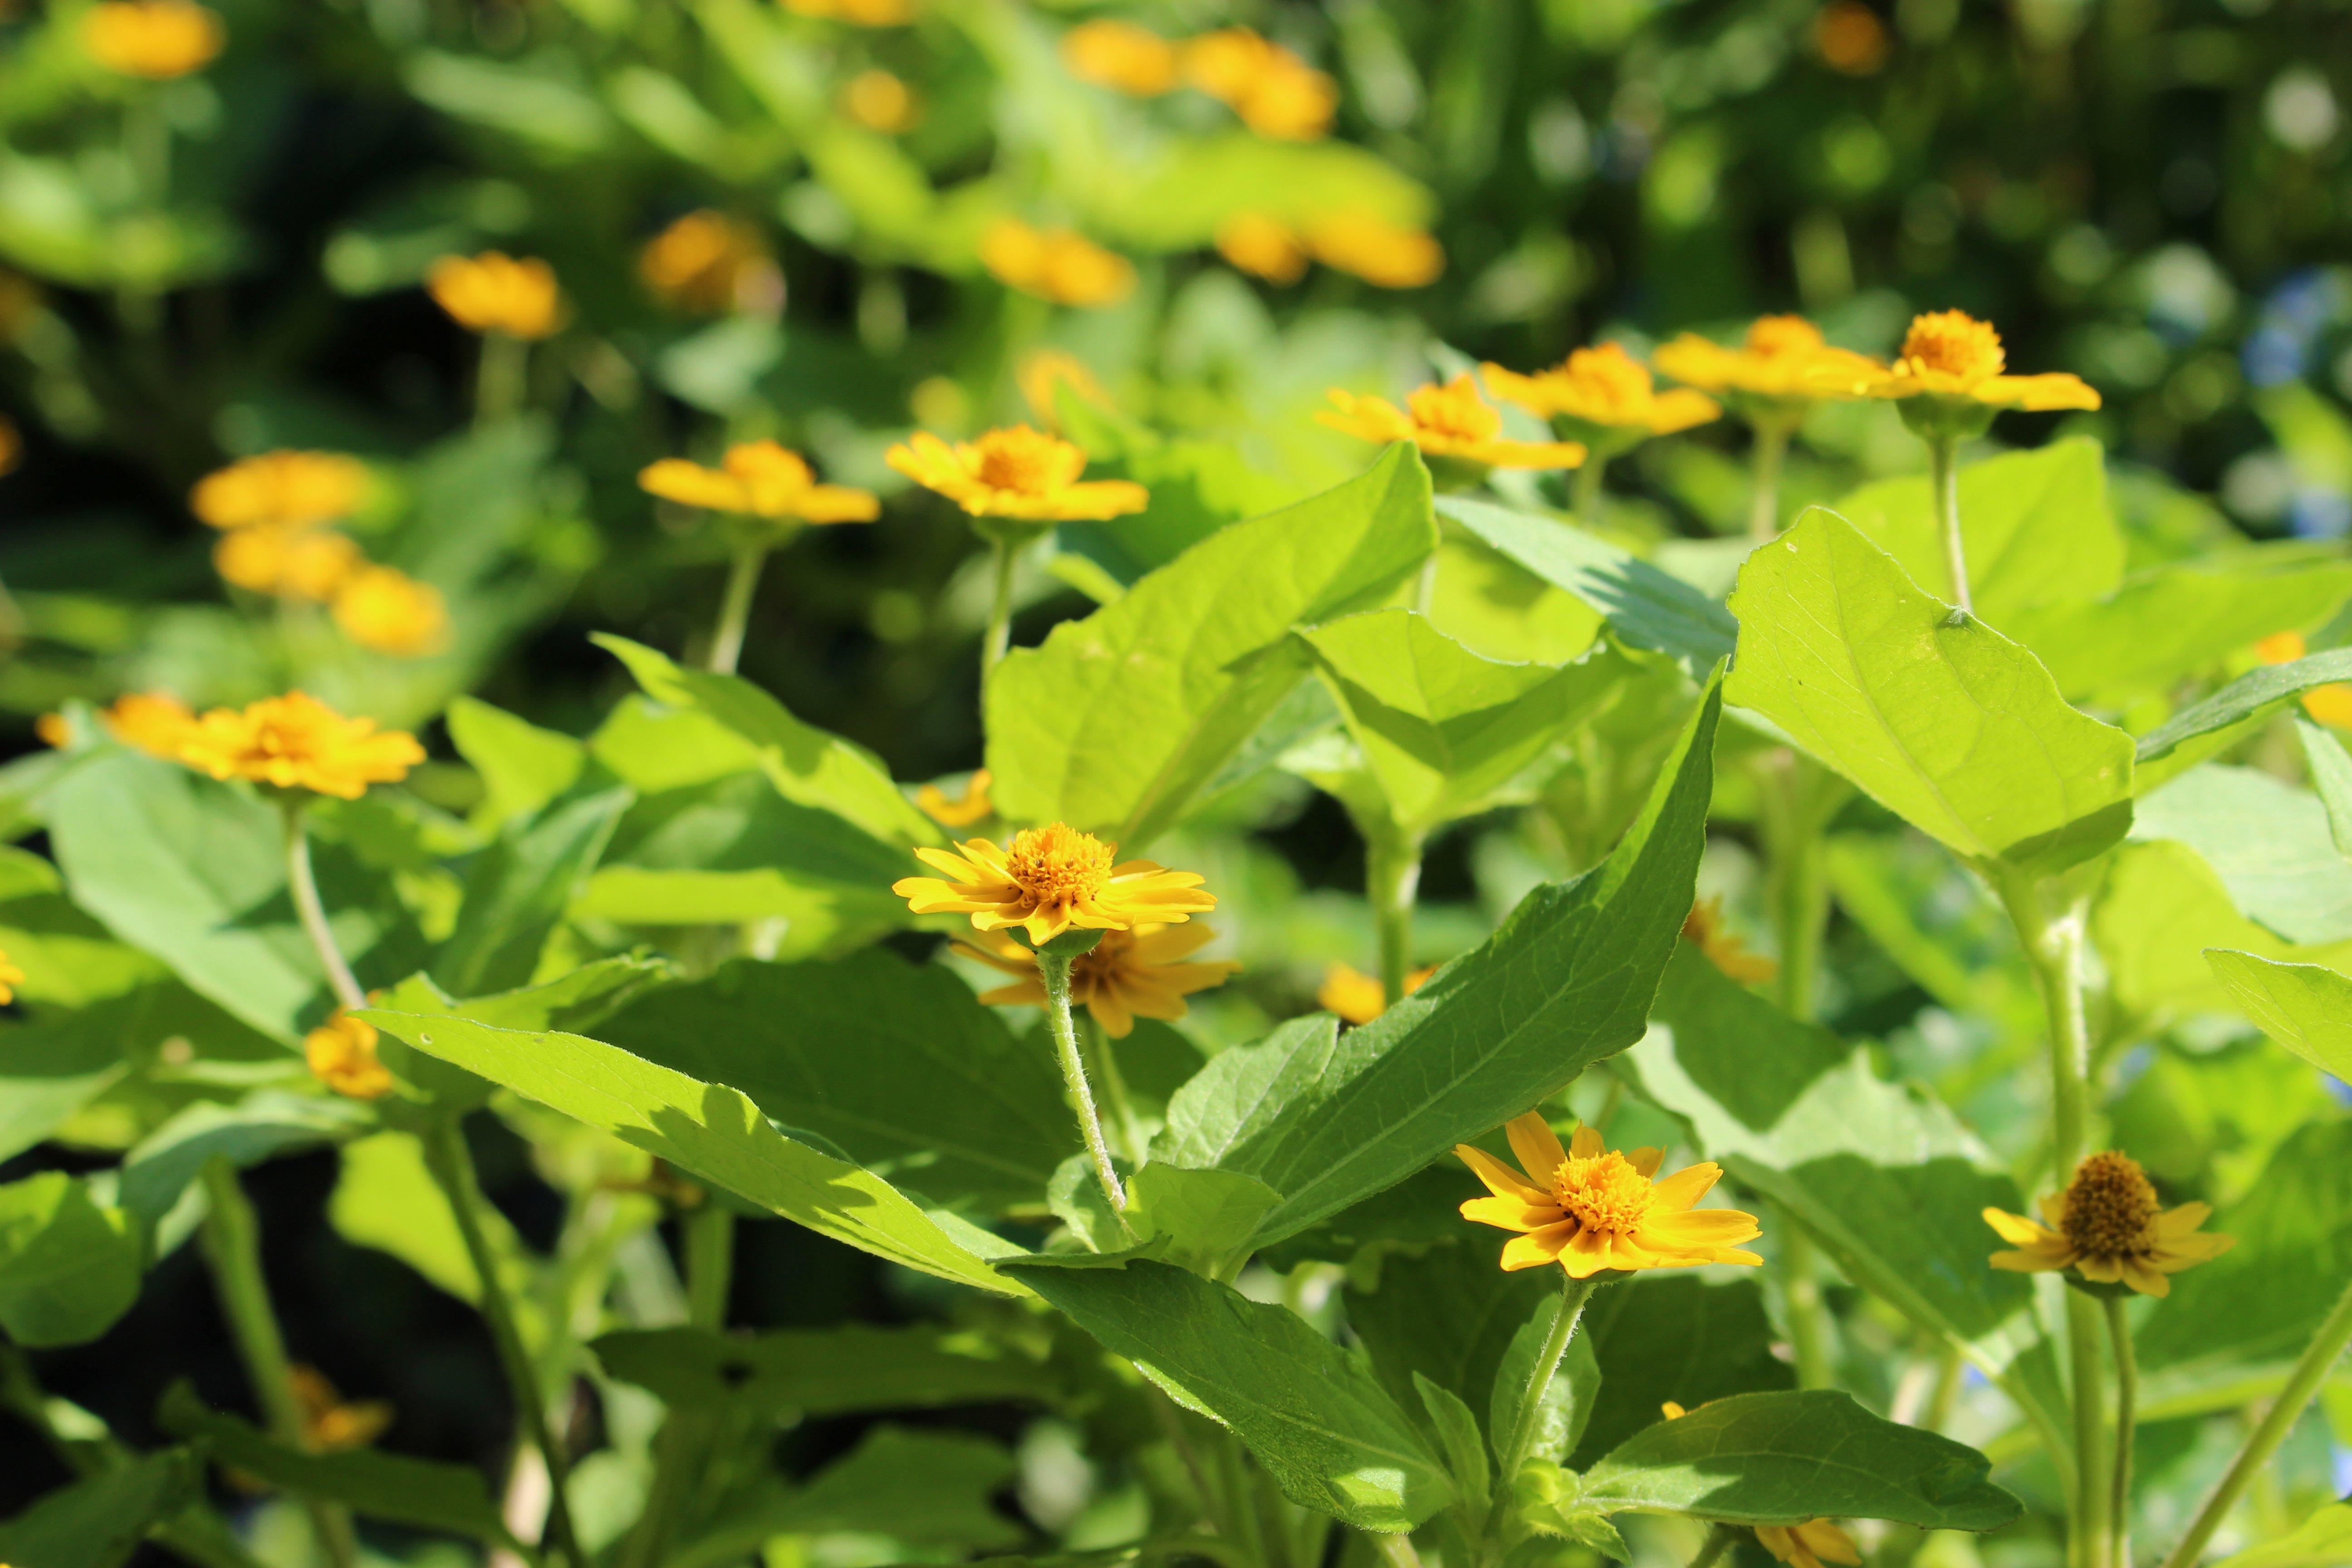 11. Butter daisy (Melampodium paludosum)